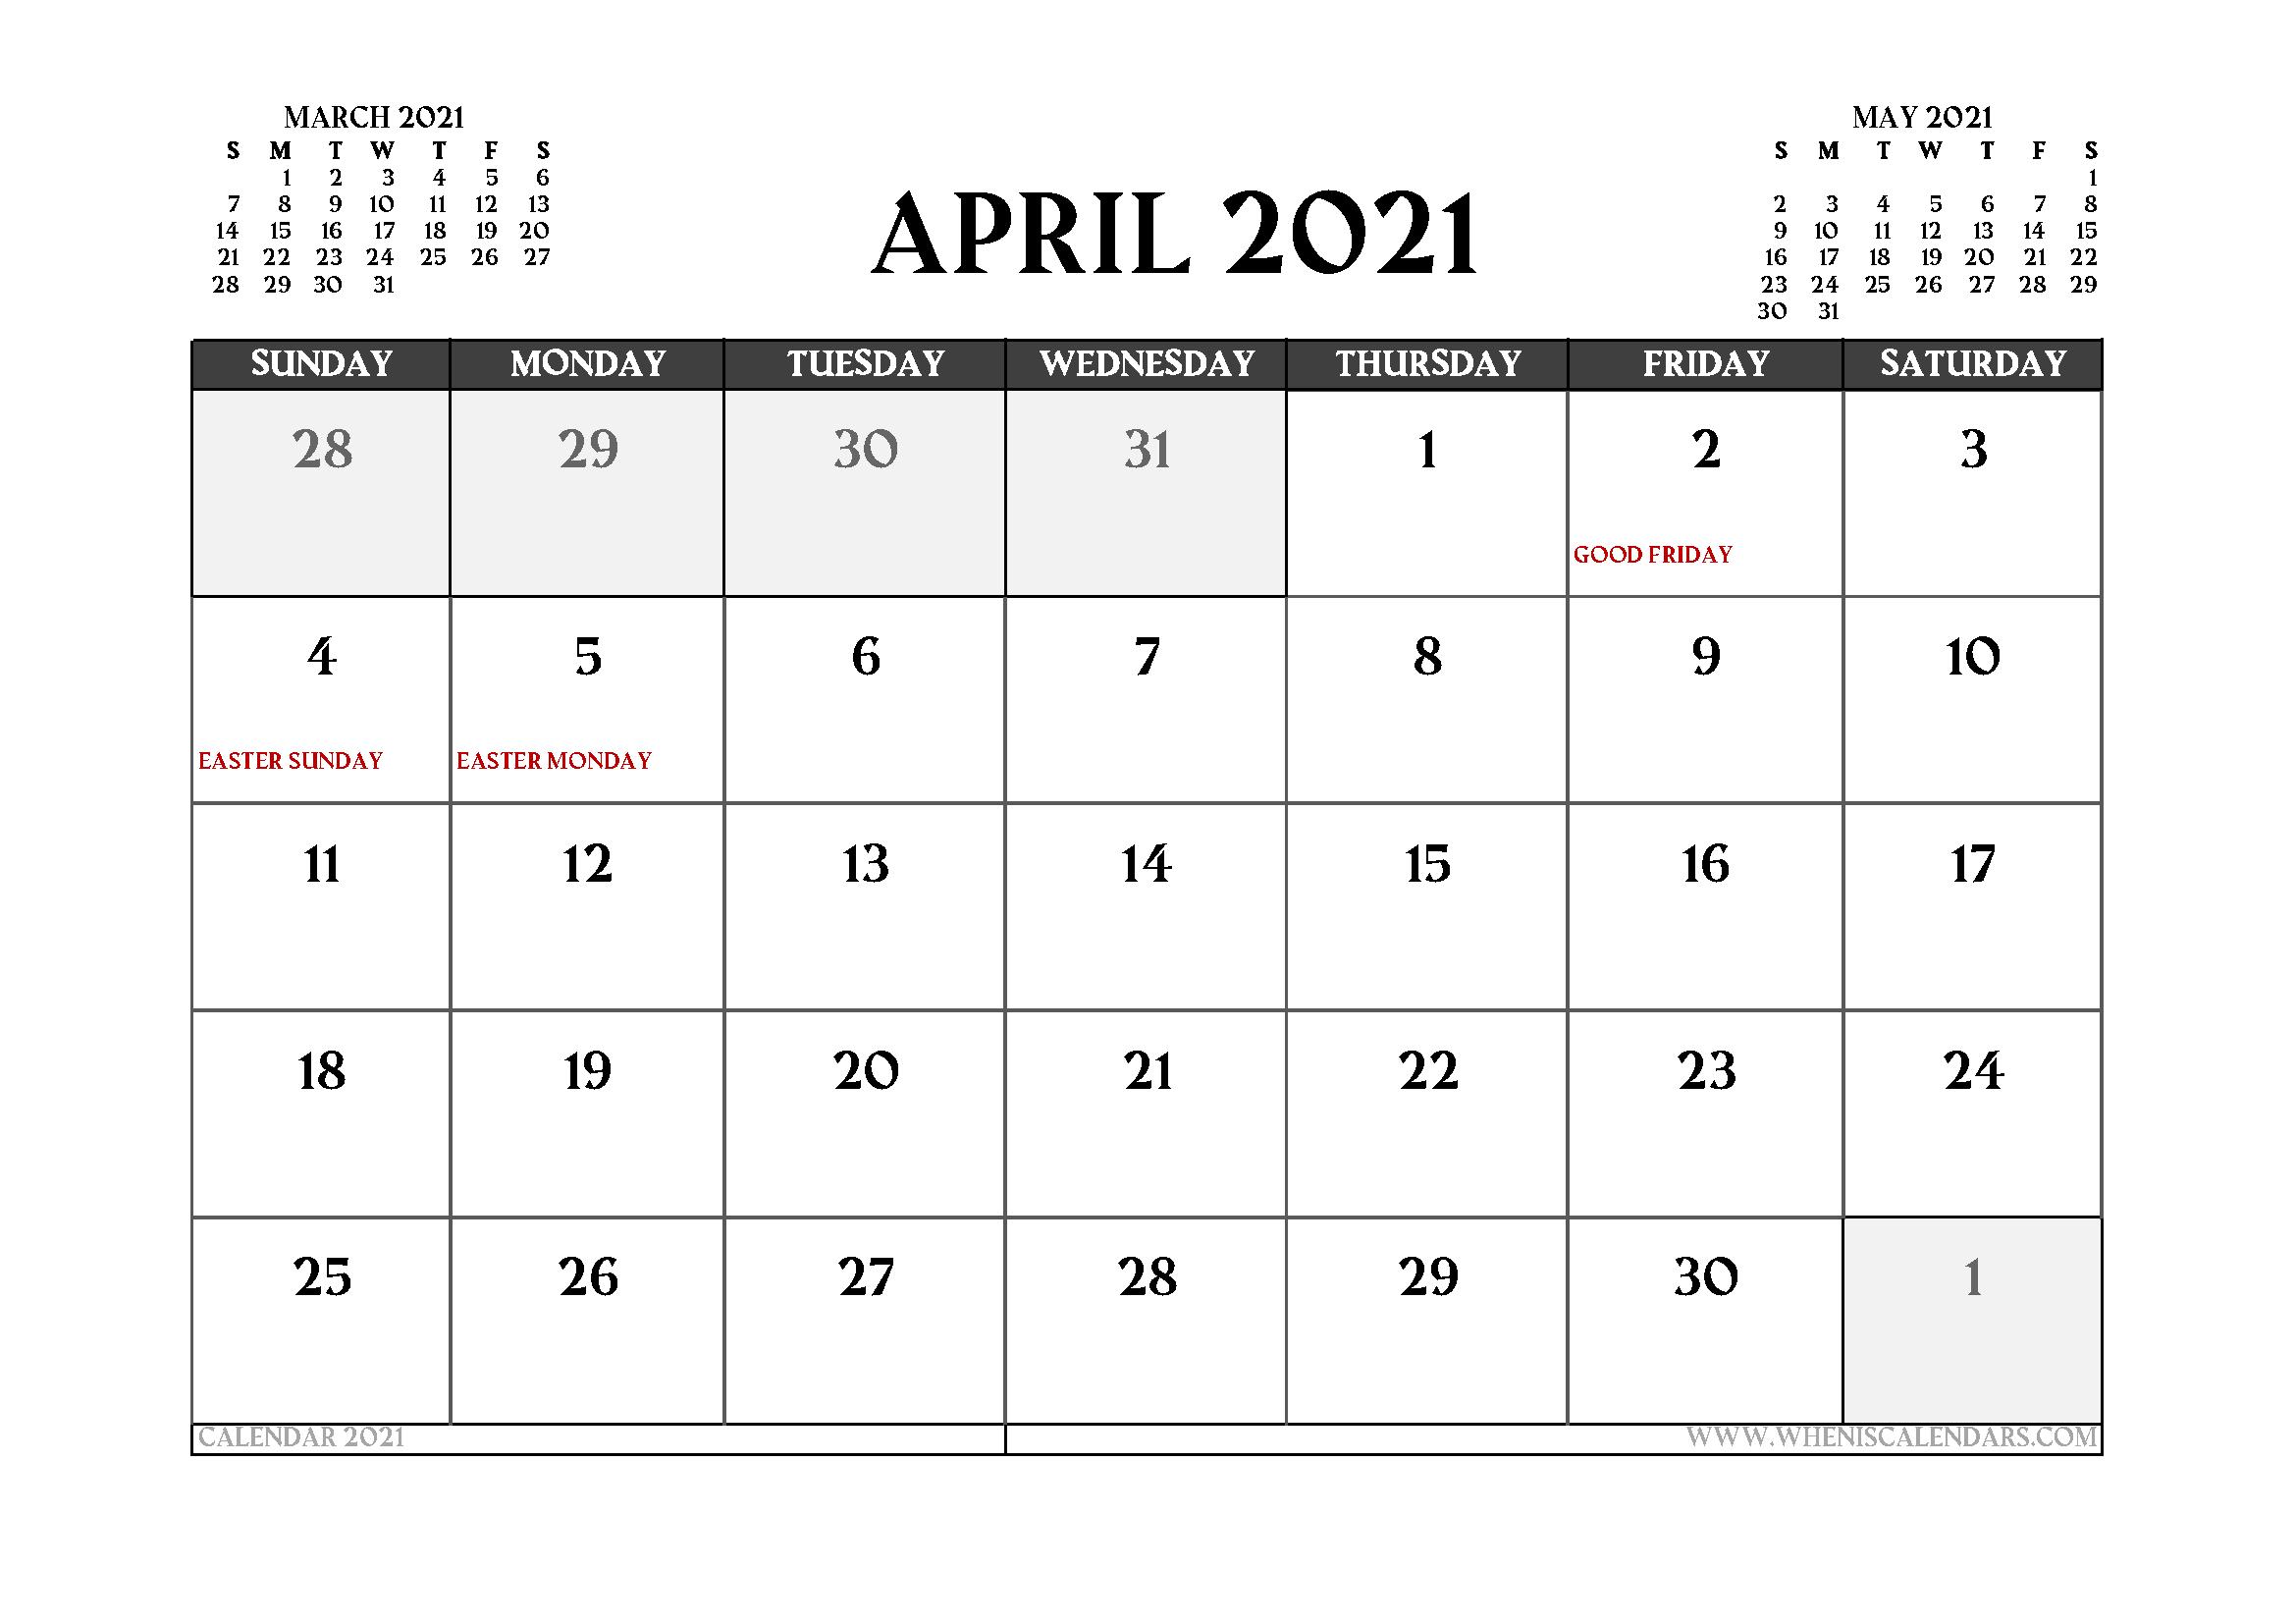 April 2021 Calendar With Holidays Canada